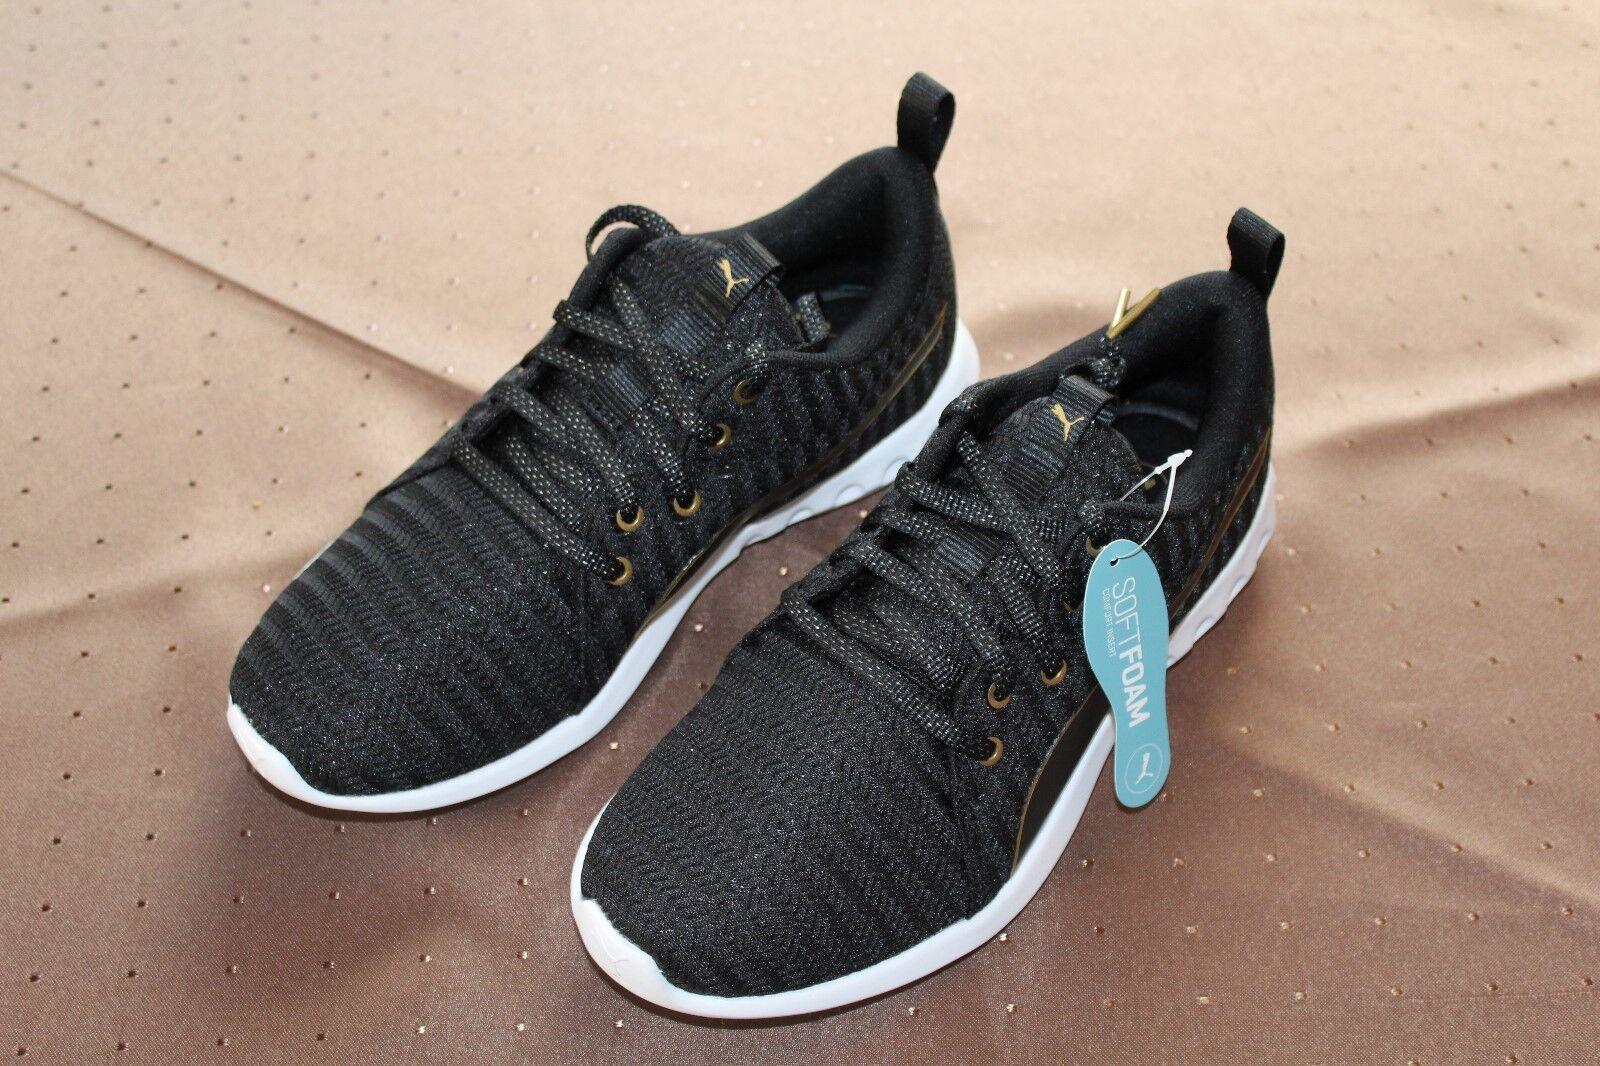 Puma Carson 2 Metallic Wn´s / Damen Sportschuh Sneaker 38,5 / Black-Gold / Gr. 38,5 Sneaker 1f75ed